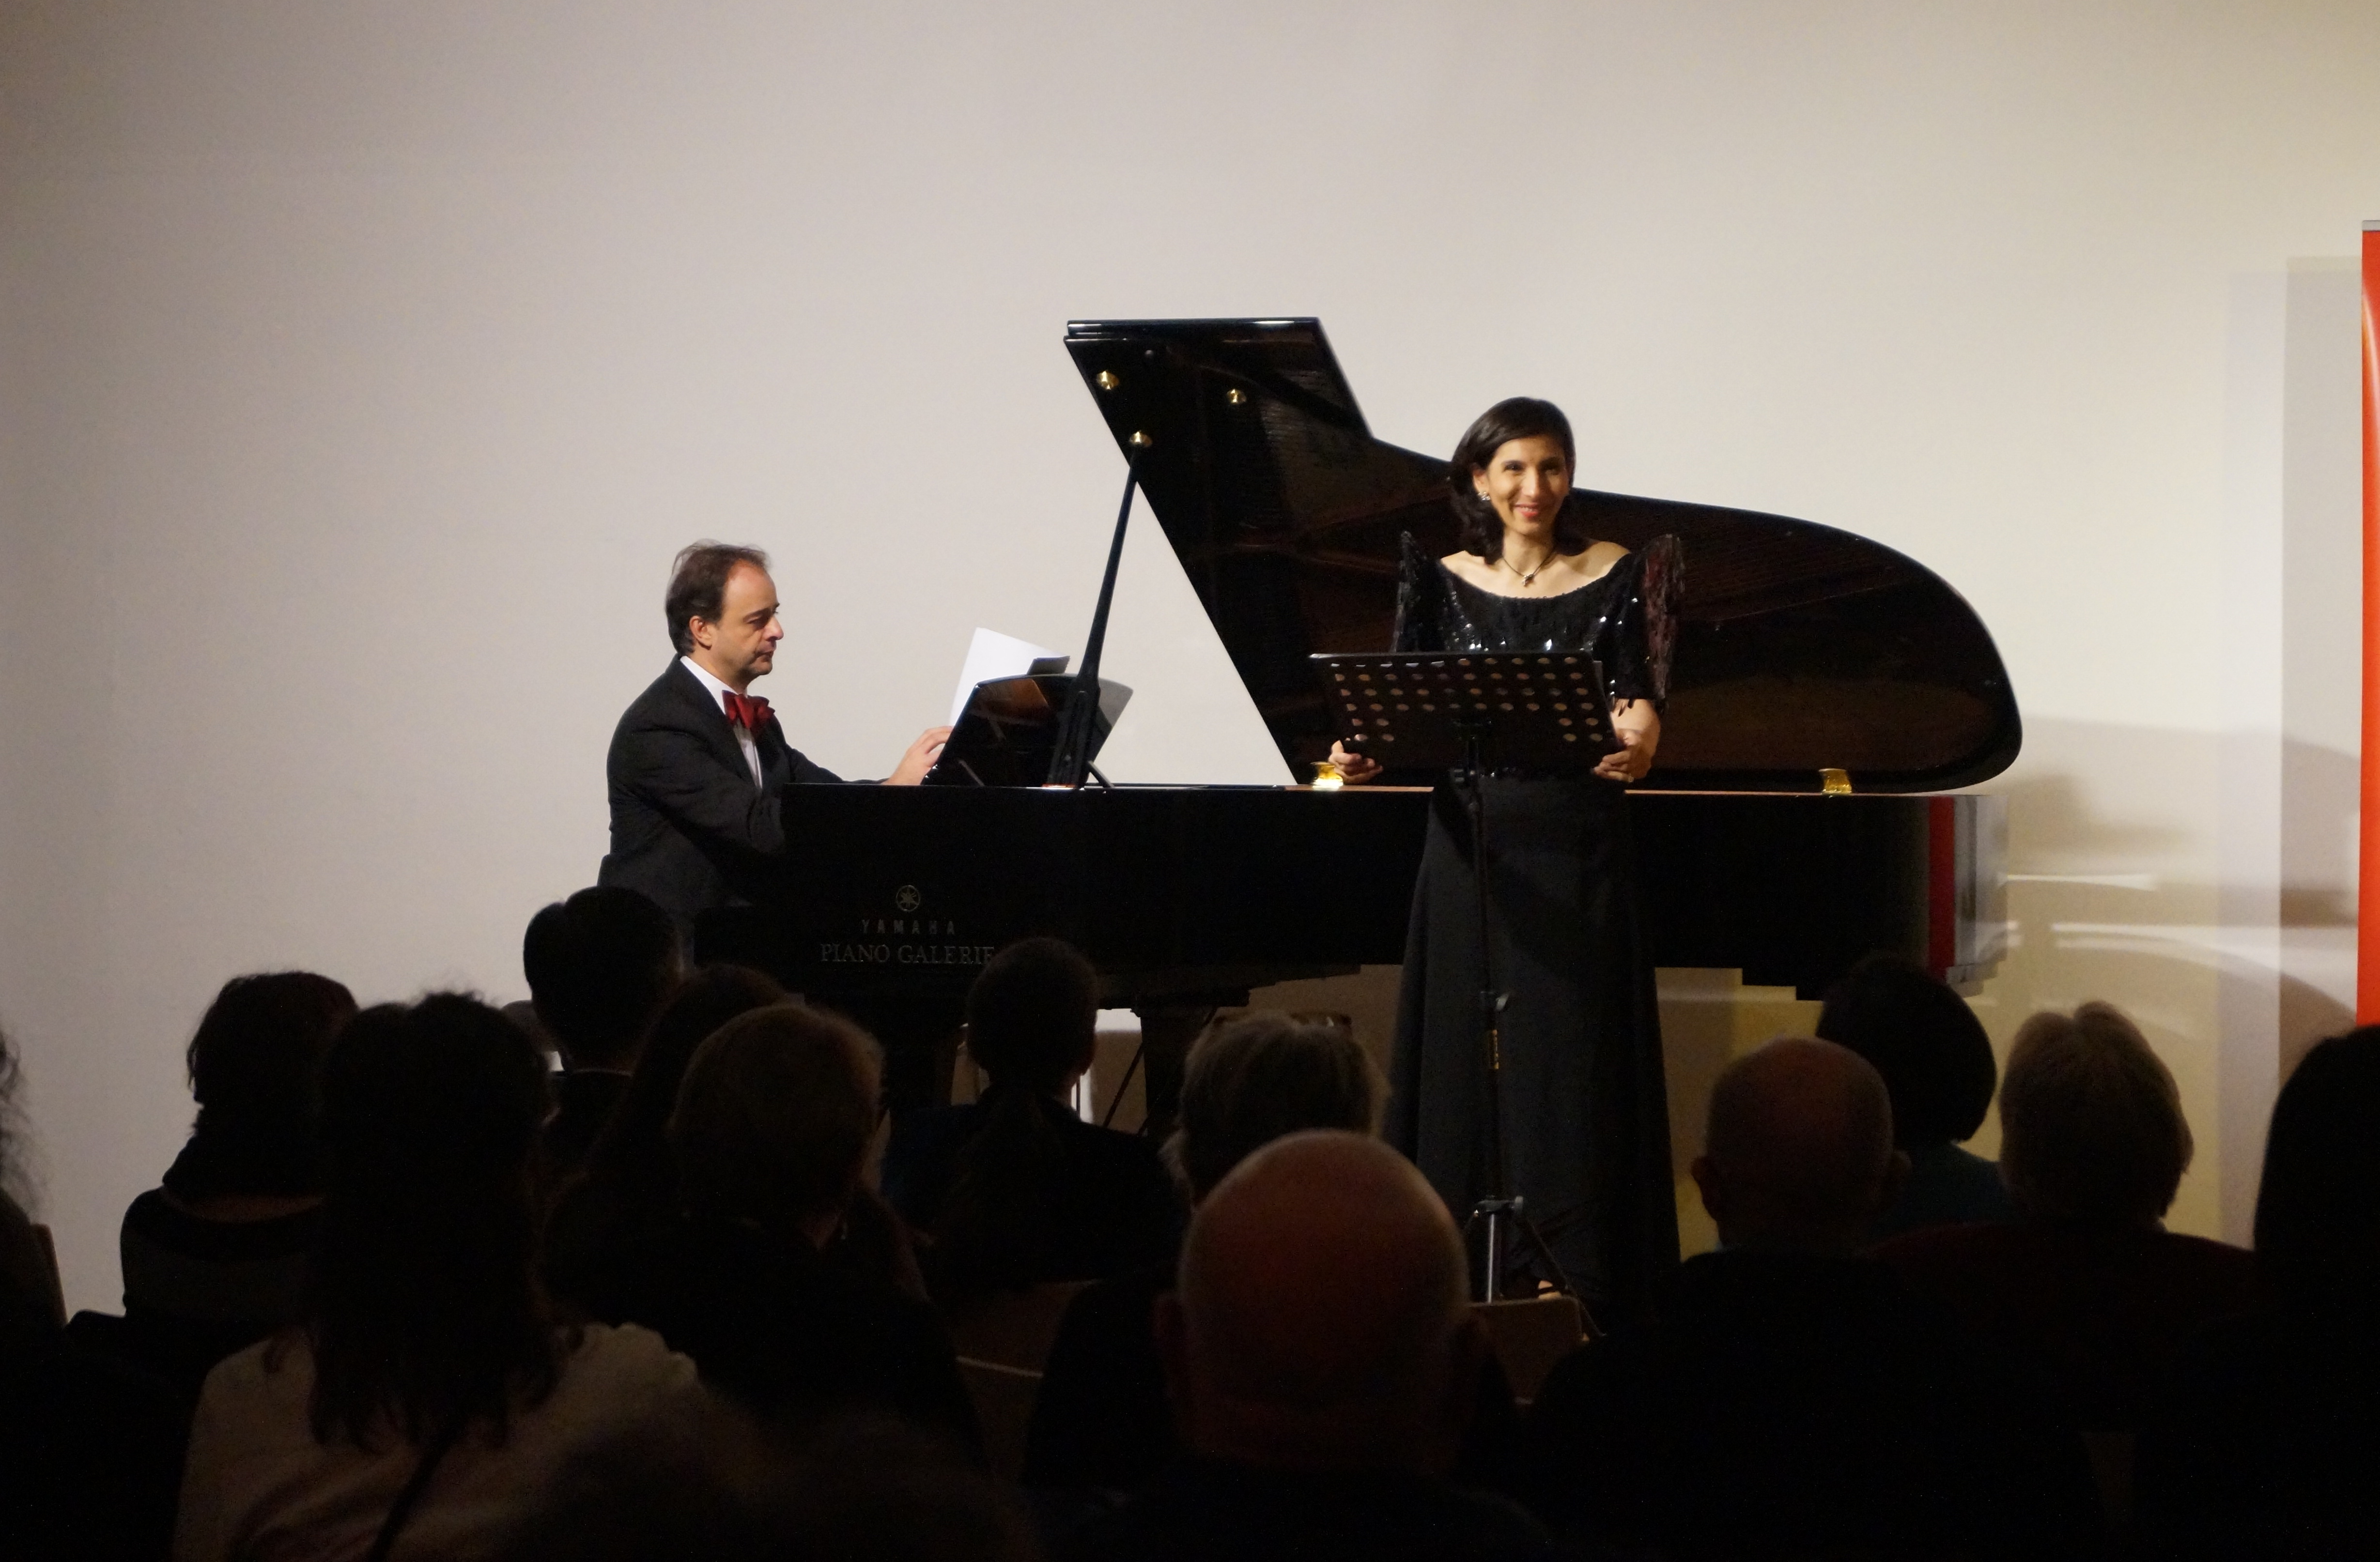 GERMANS JOIN MUSICAL CELEBRATION OF  PHILIPPINE-SPANISH FRIENDSHIP